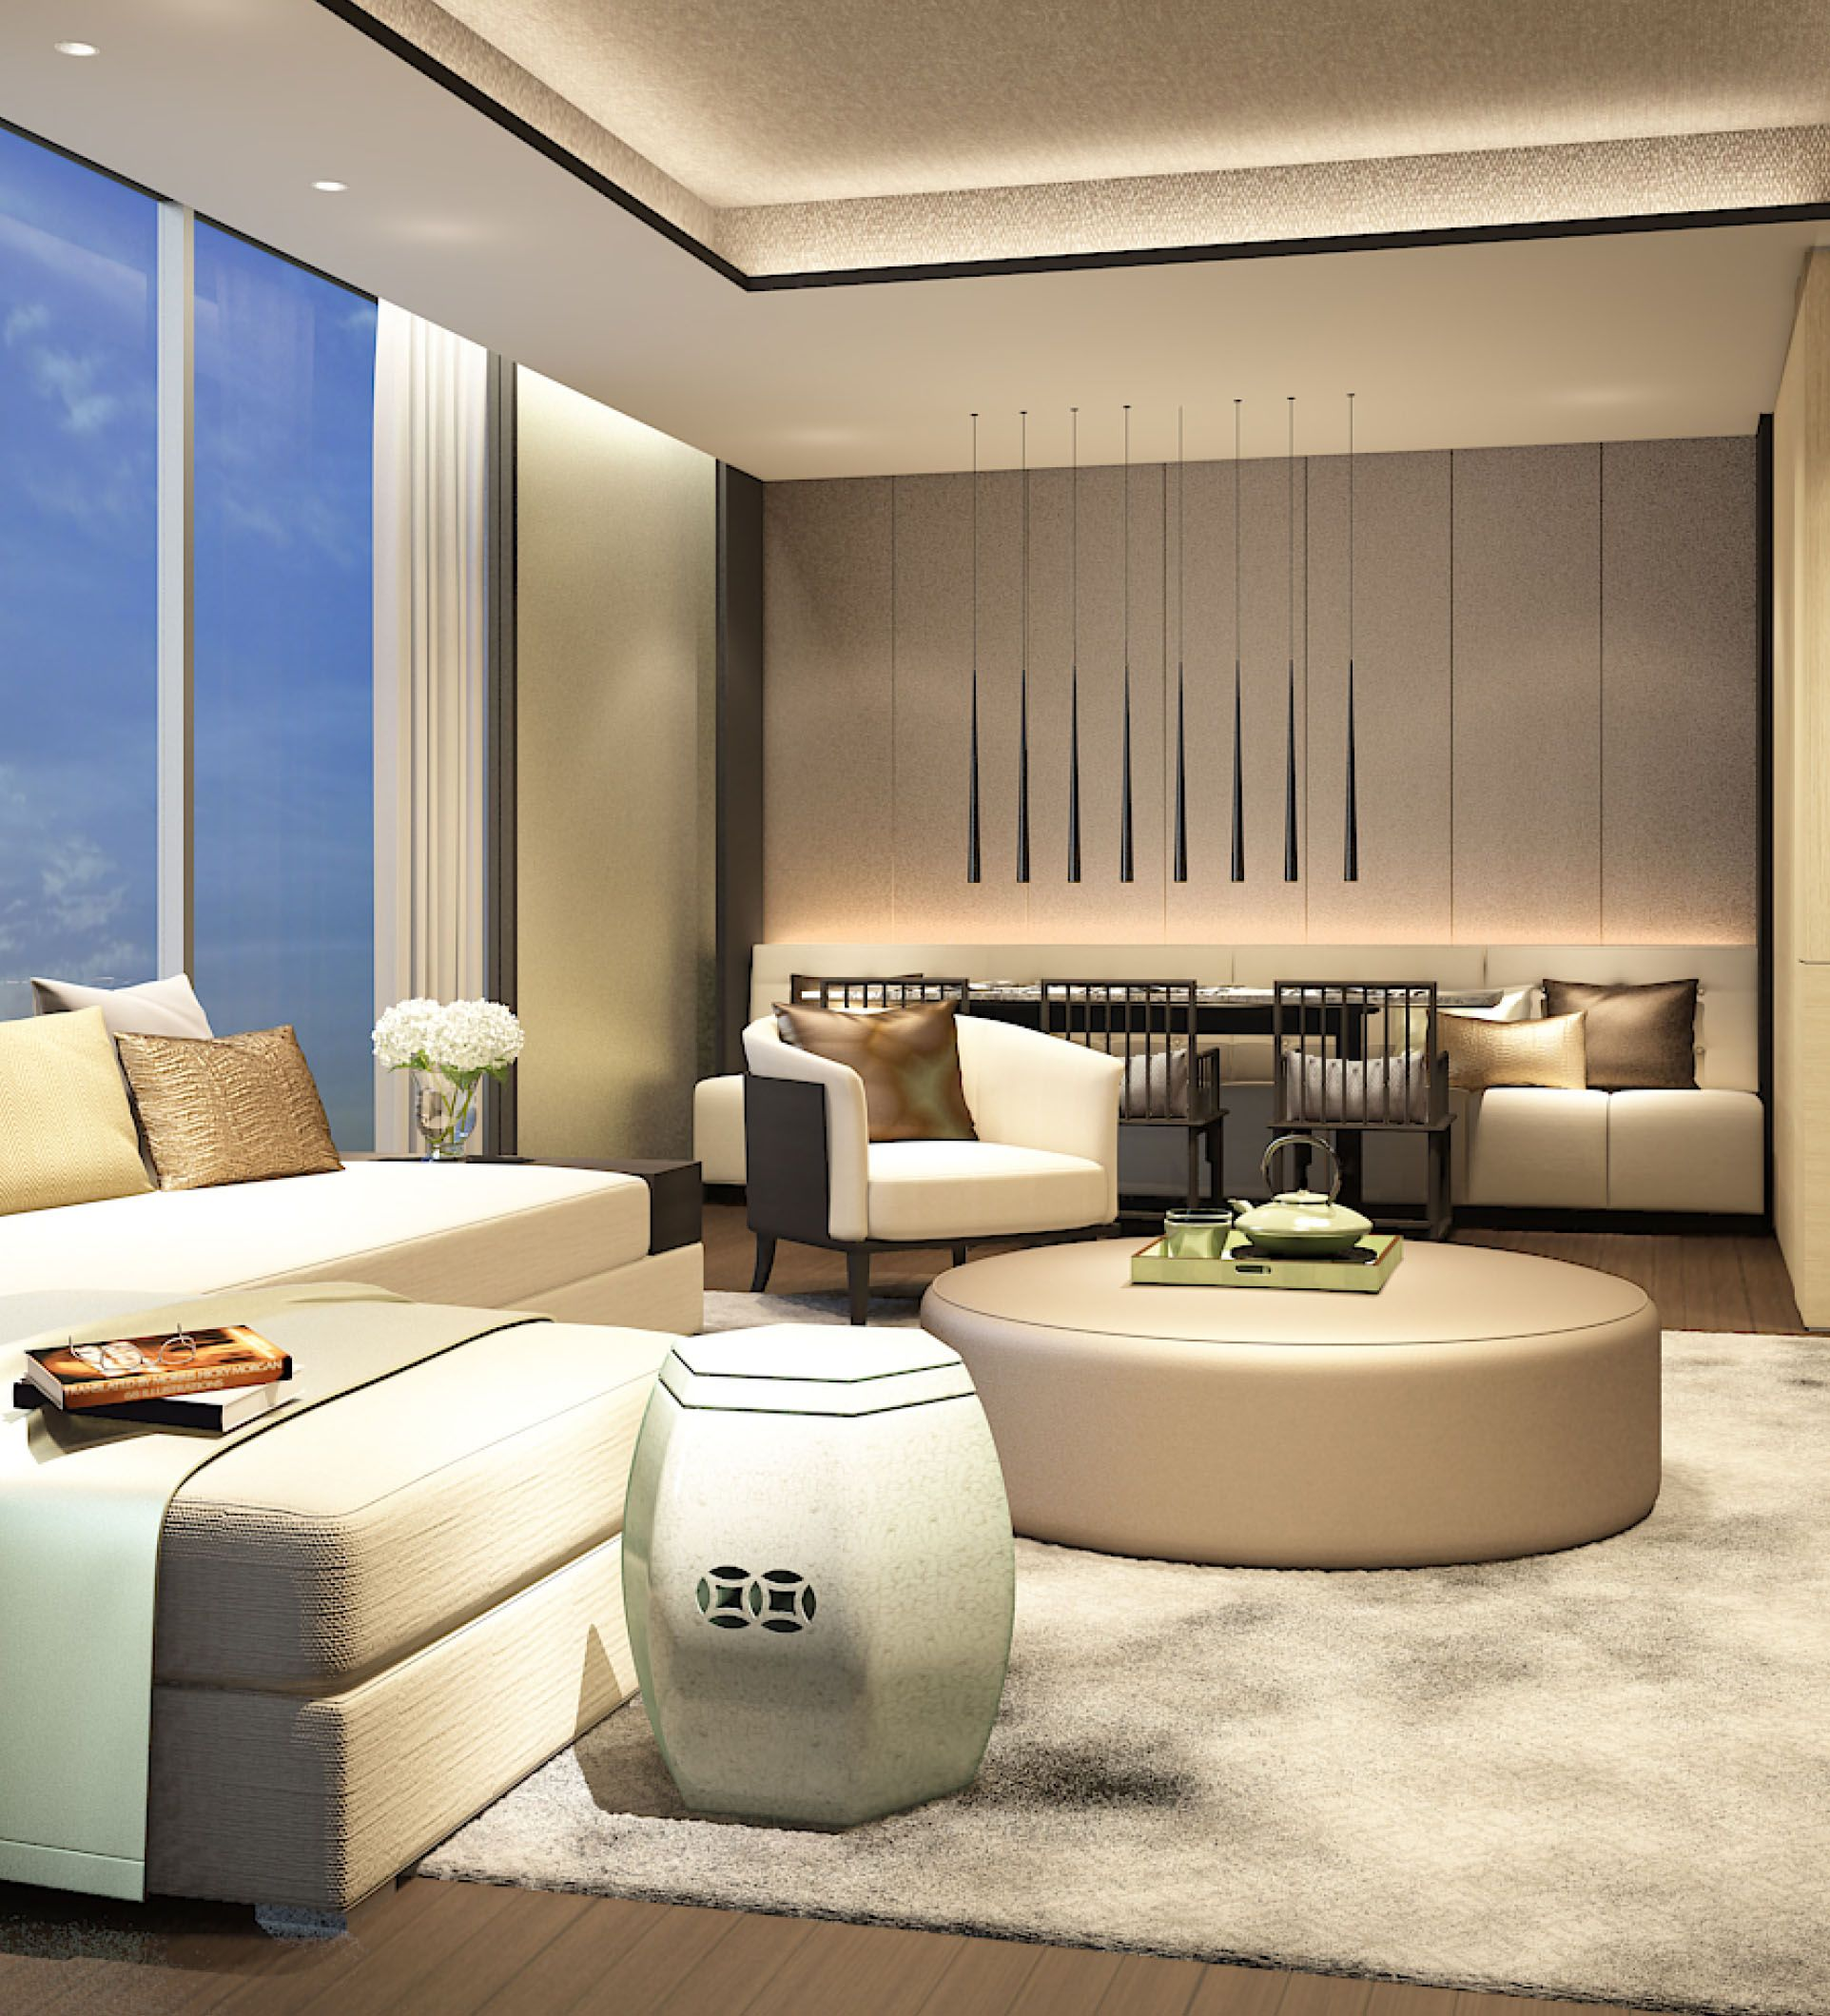 Scda Hotel & Mixed- Development Nanjing China